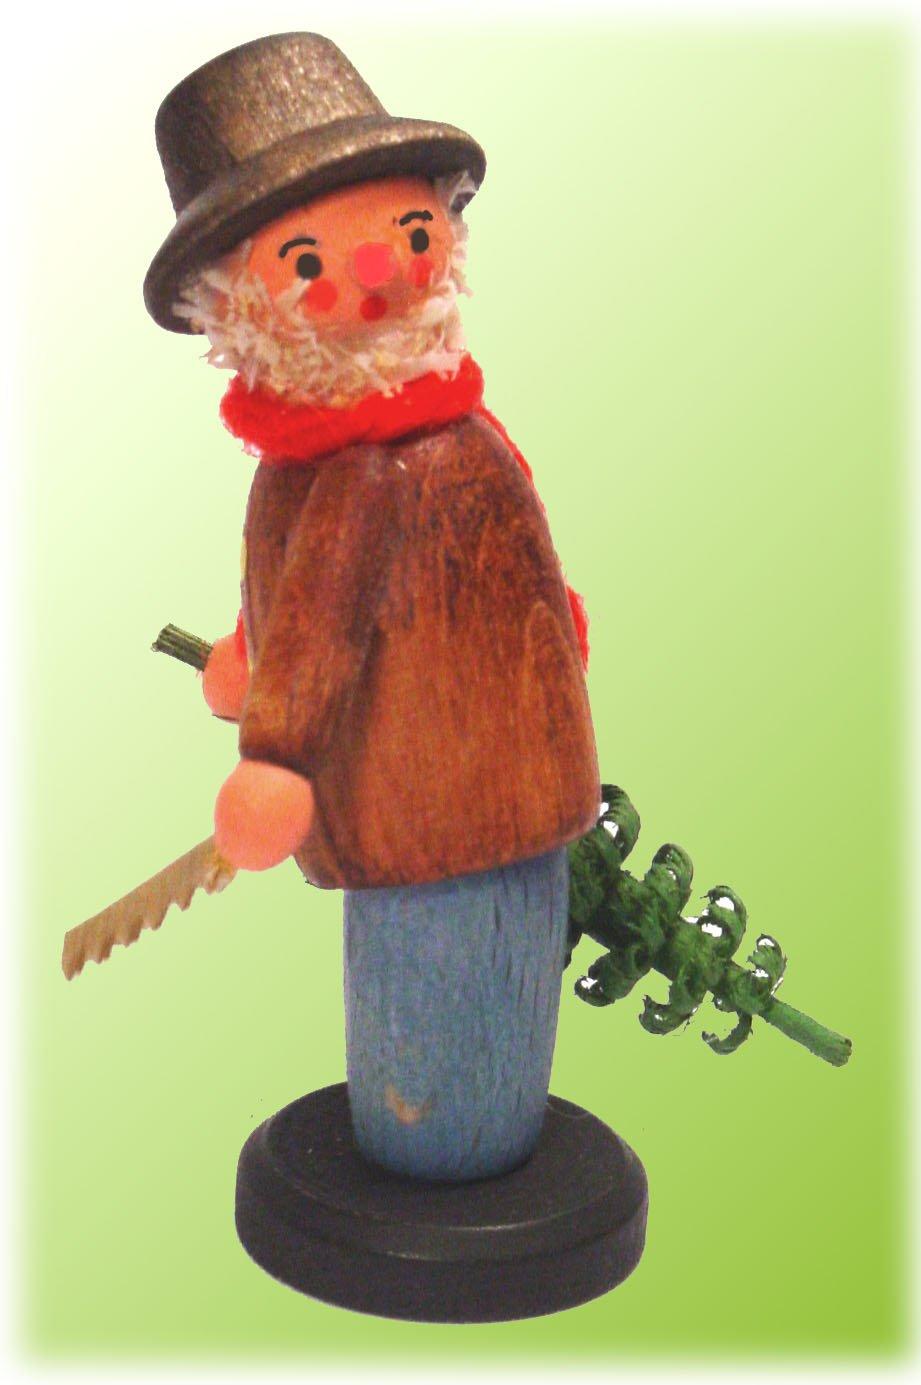 ... 75 Erzgebirge German Handcrafted Wood Miniature Christmas Tree Cutter